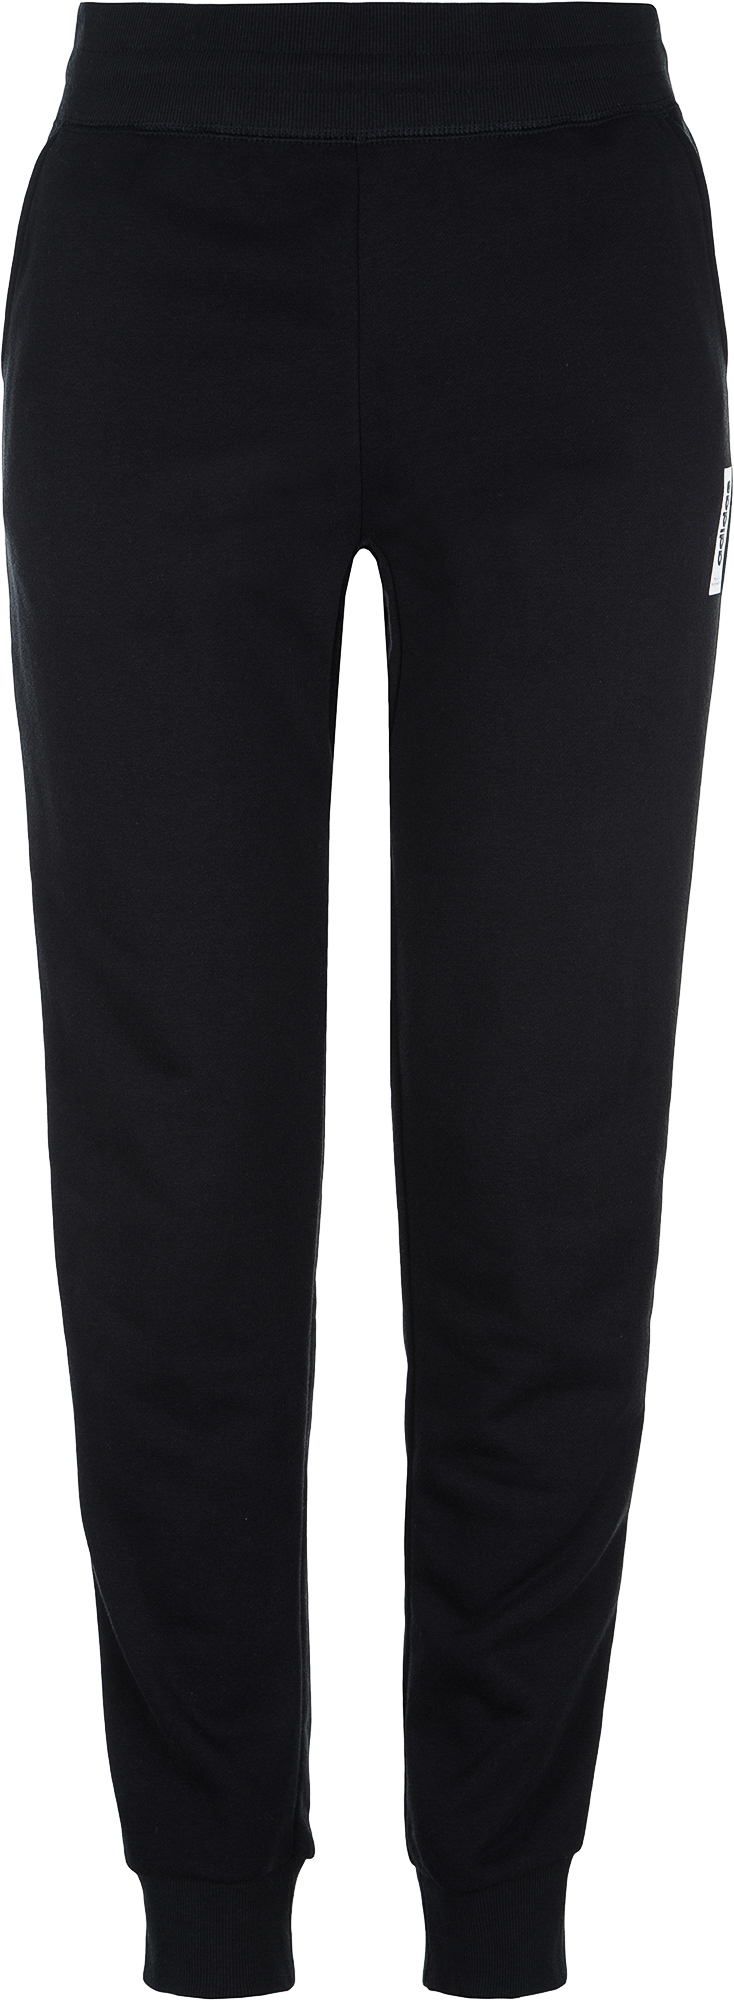 Adidas Брюки женские Brilliant Basics, размер 54-56